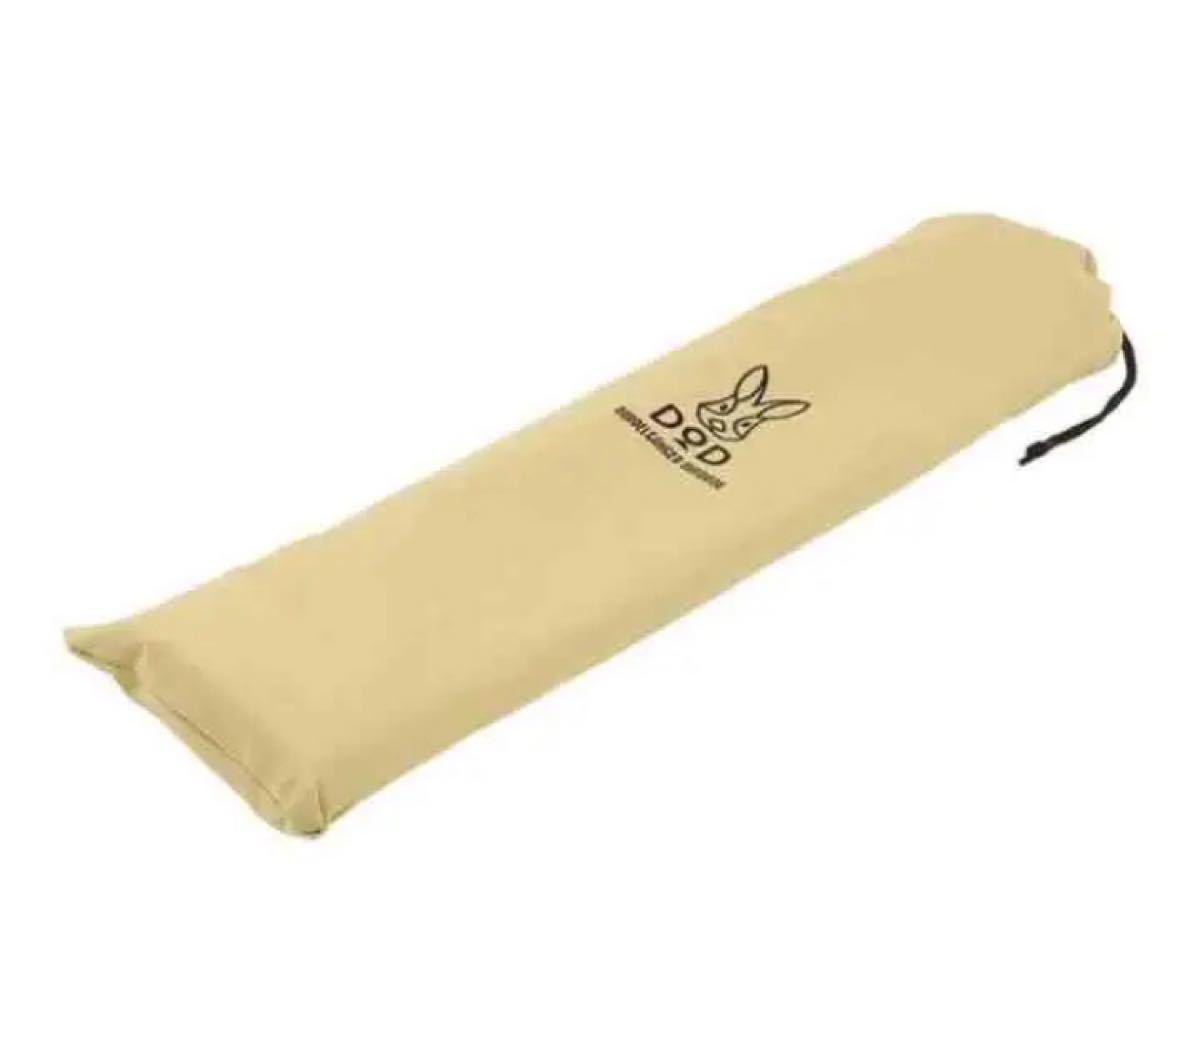 DOD キャンピングベッド ベージュ2台セット新品アウトドア コット キャンプBBQ 公園 お庭 ディーオーディー